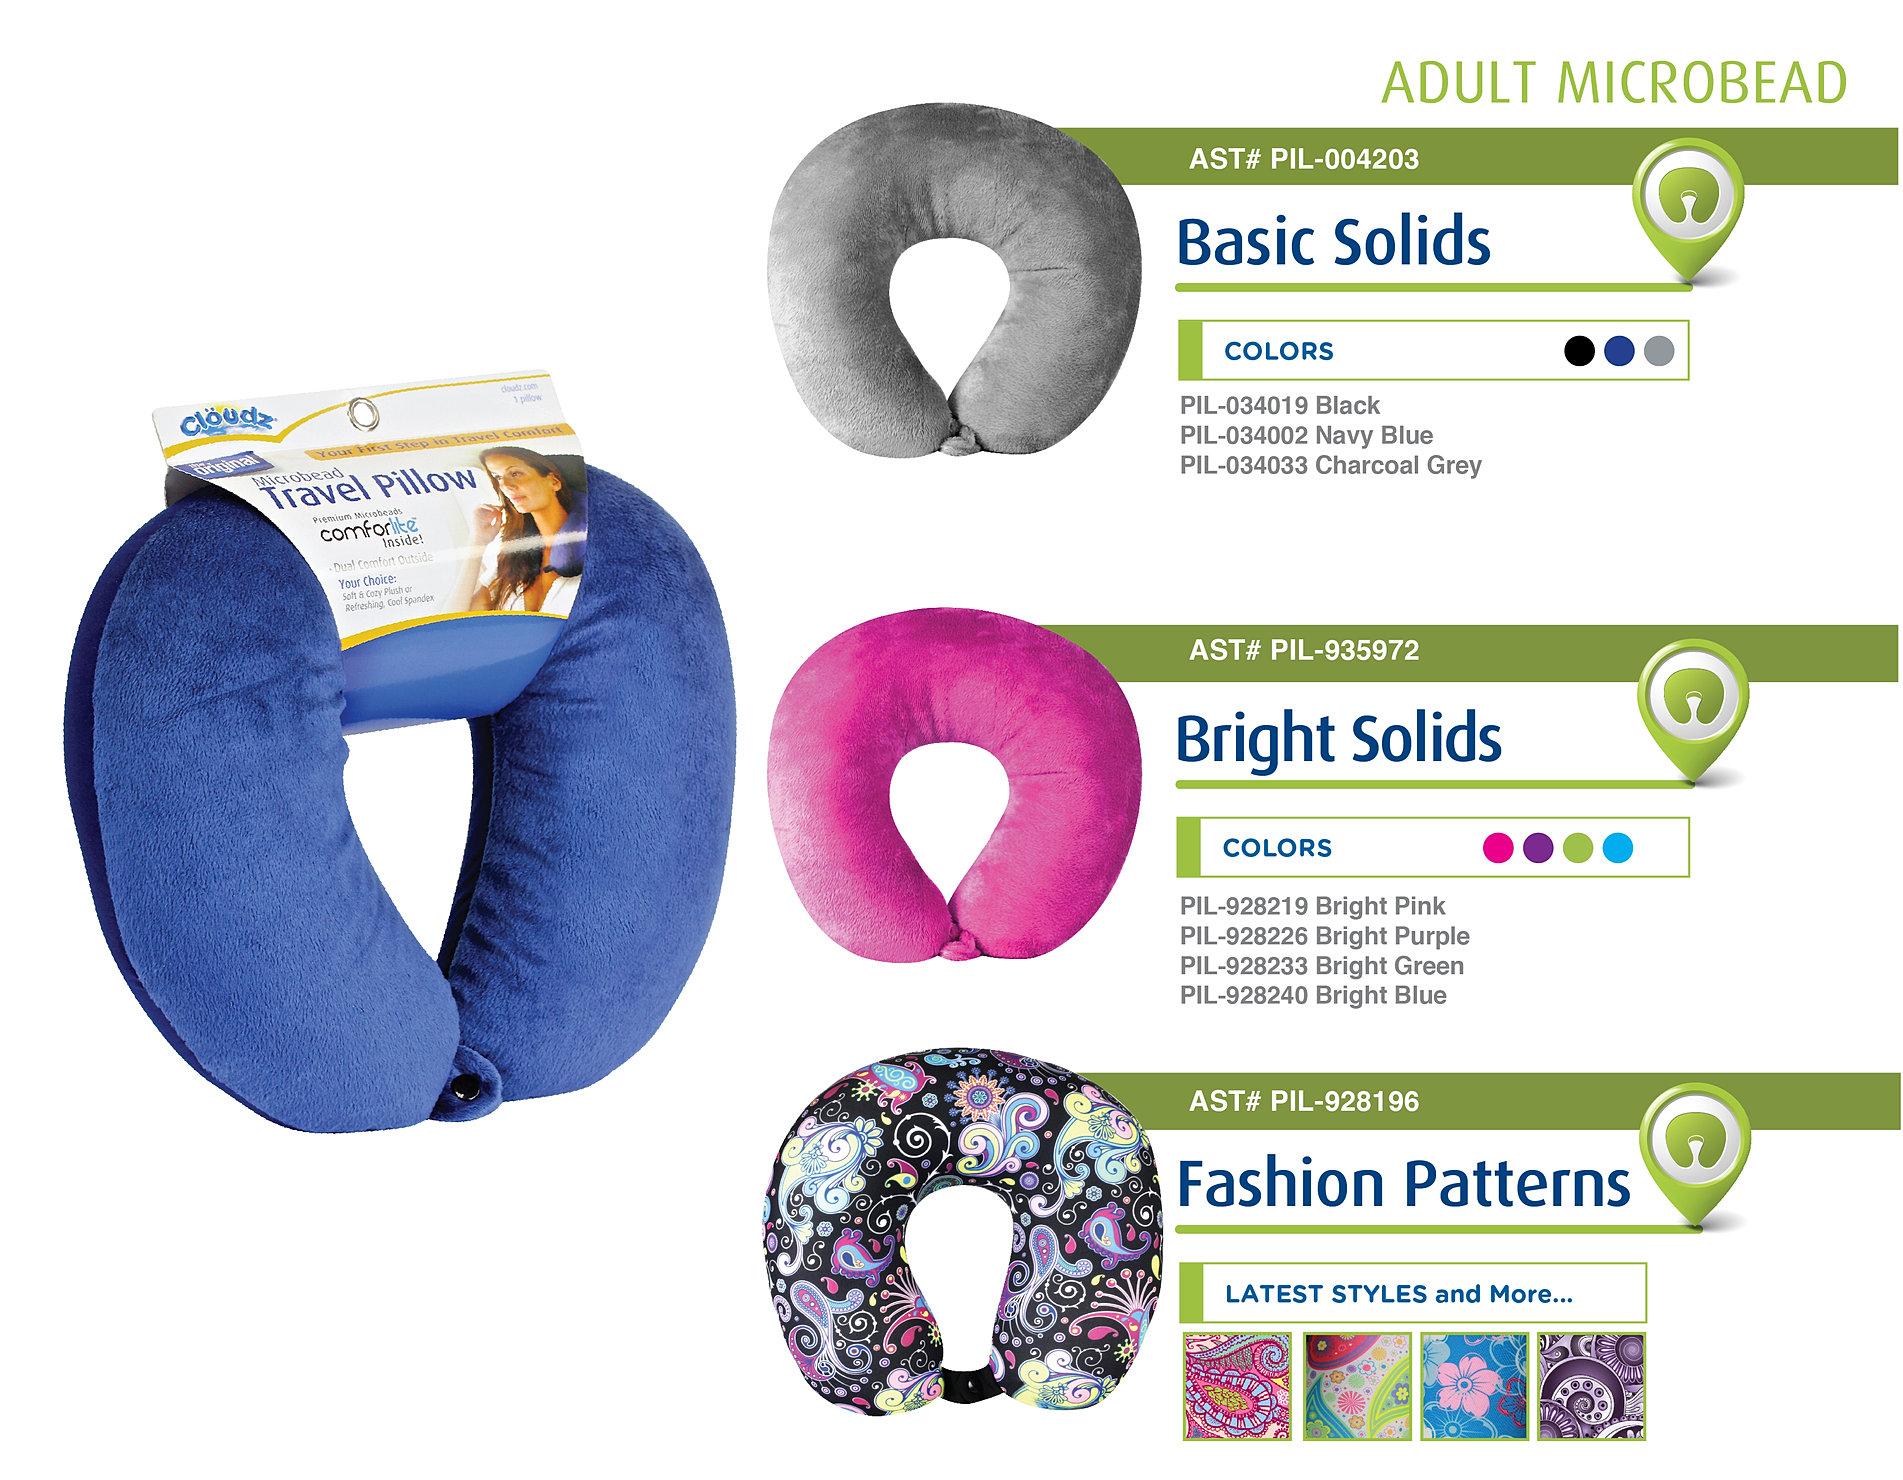 Snitoday Microbead Travel Pillows